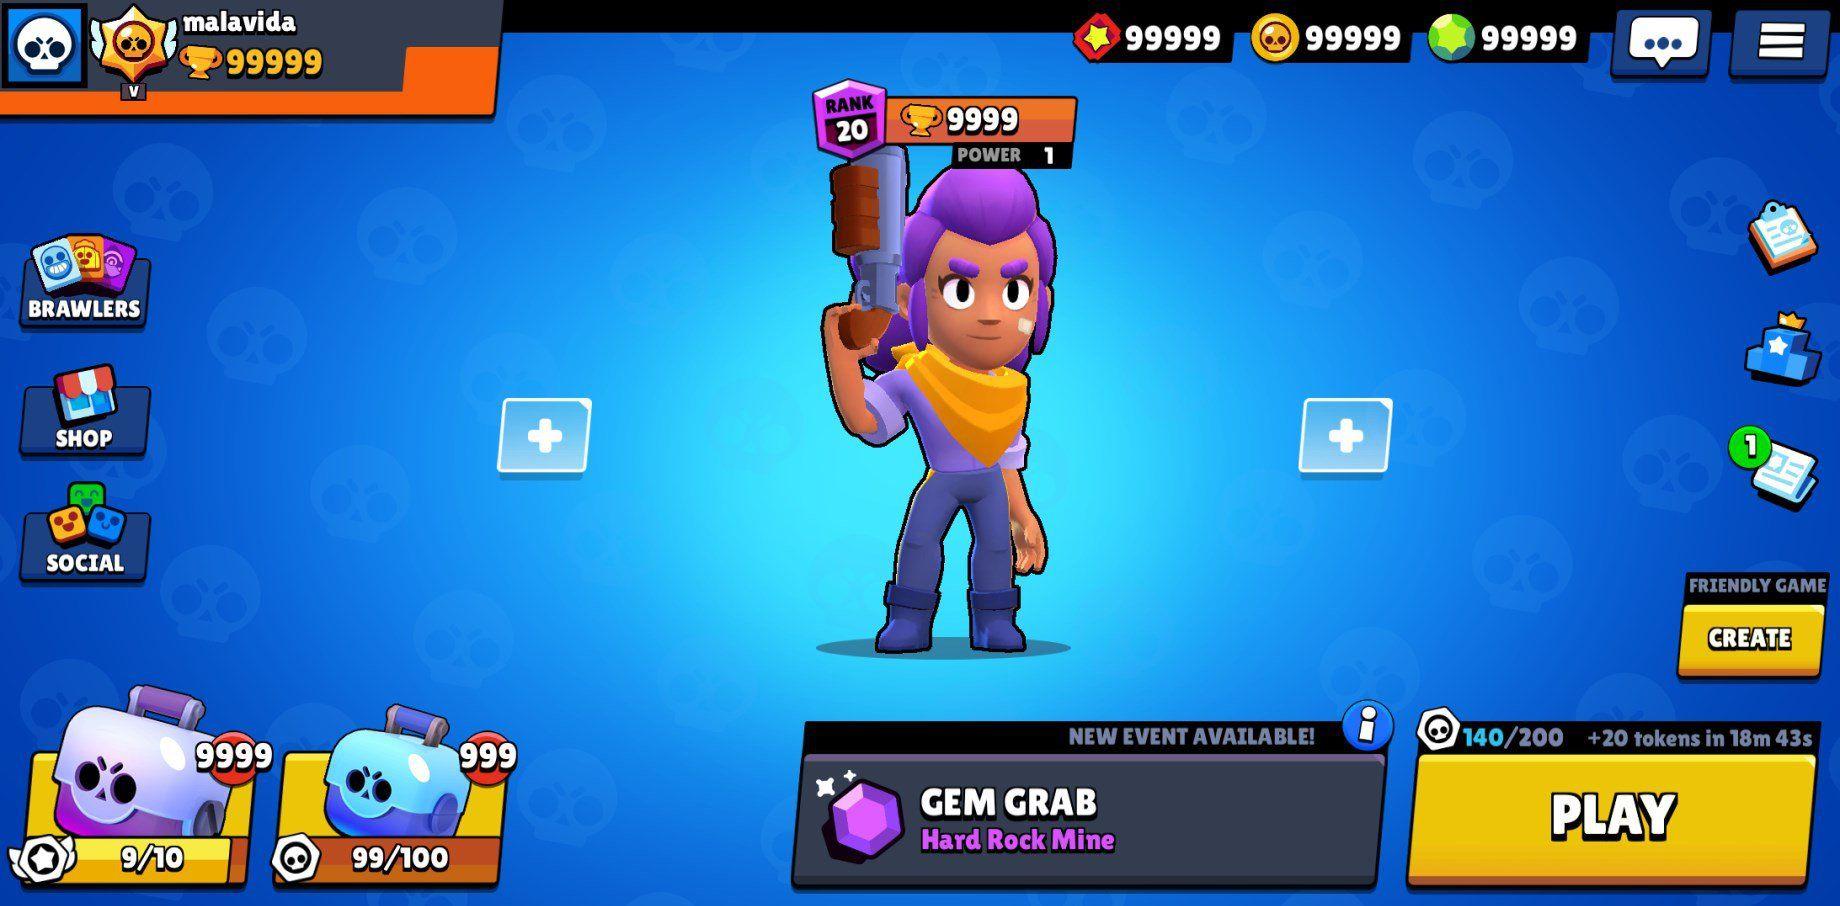 Gems Coins Method Working Personajes De Juegos Personajes De Videojuegos Juegos Multijugador